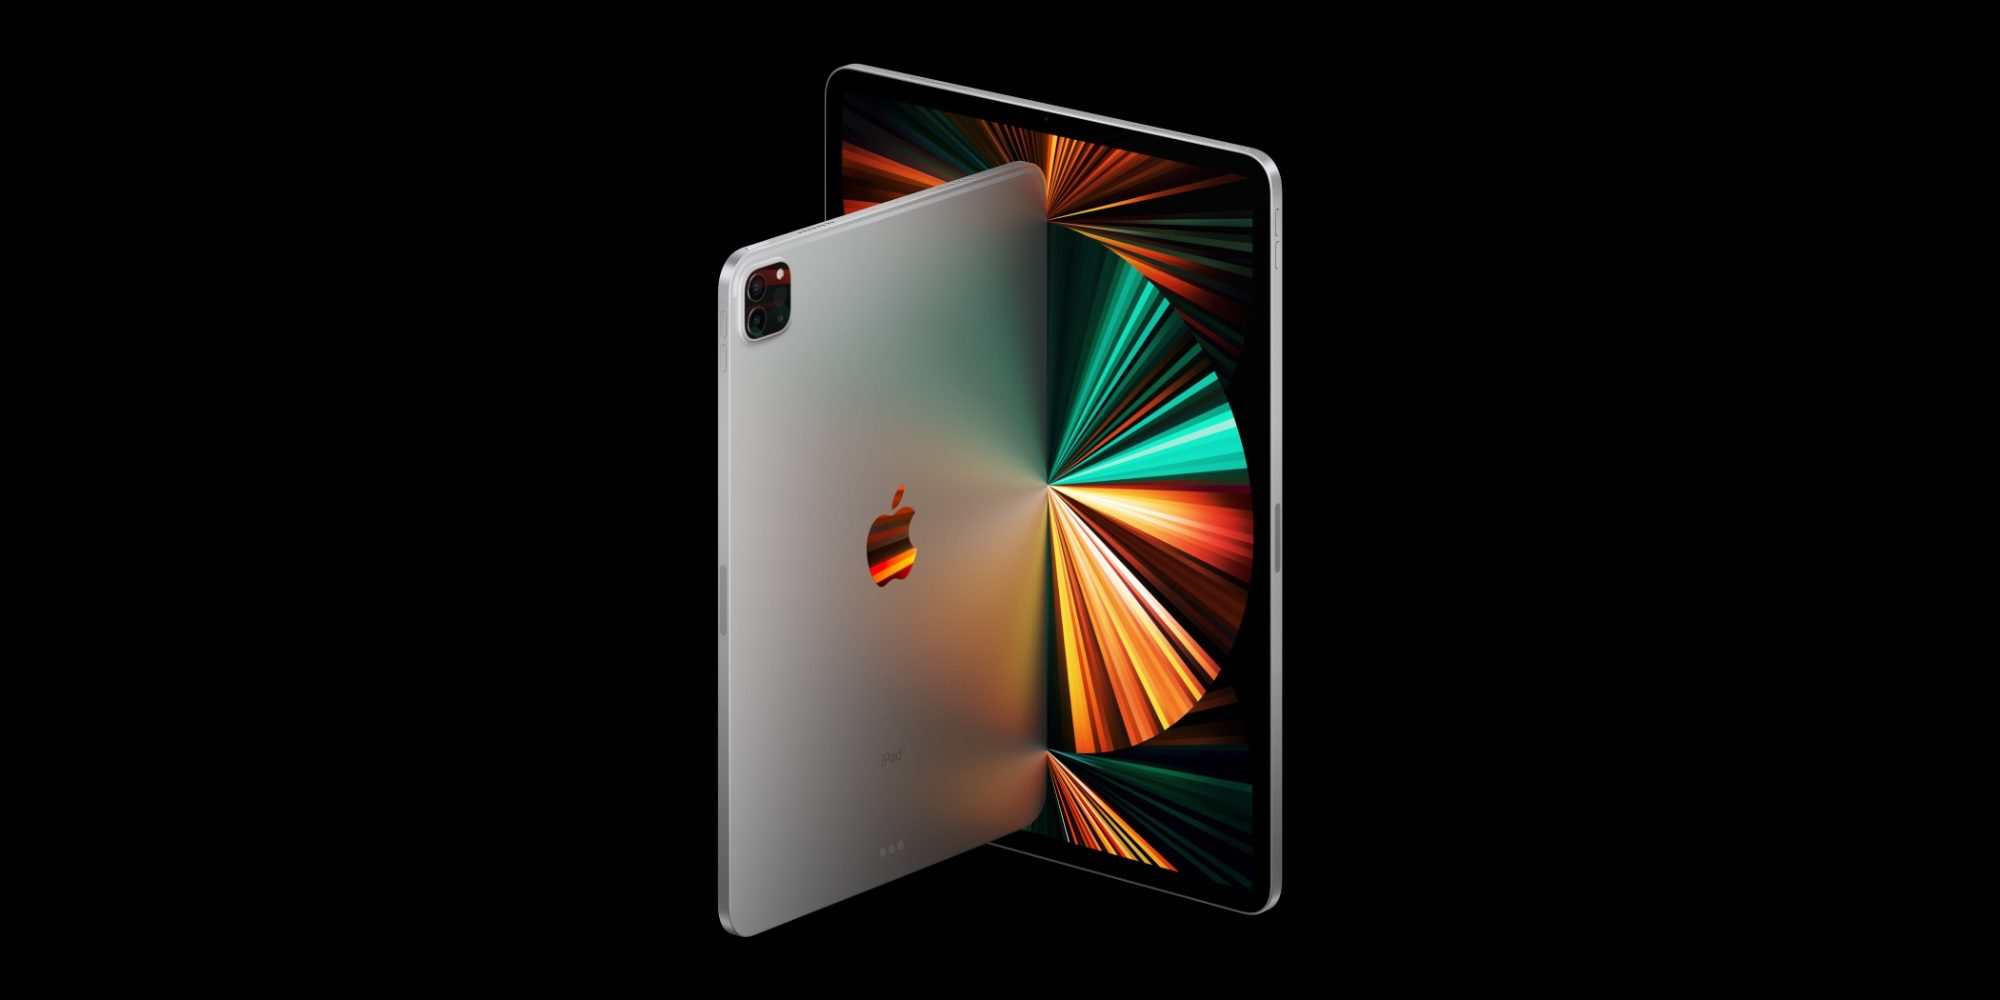 M1 11-inch iPad Pro